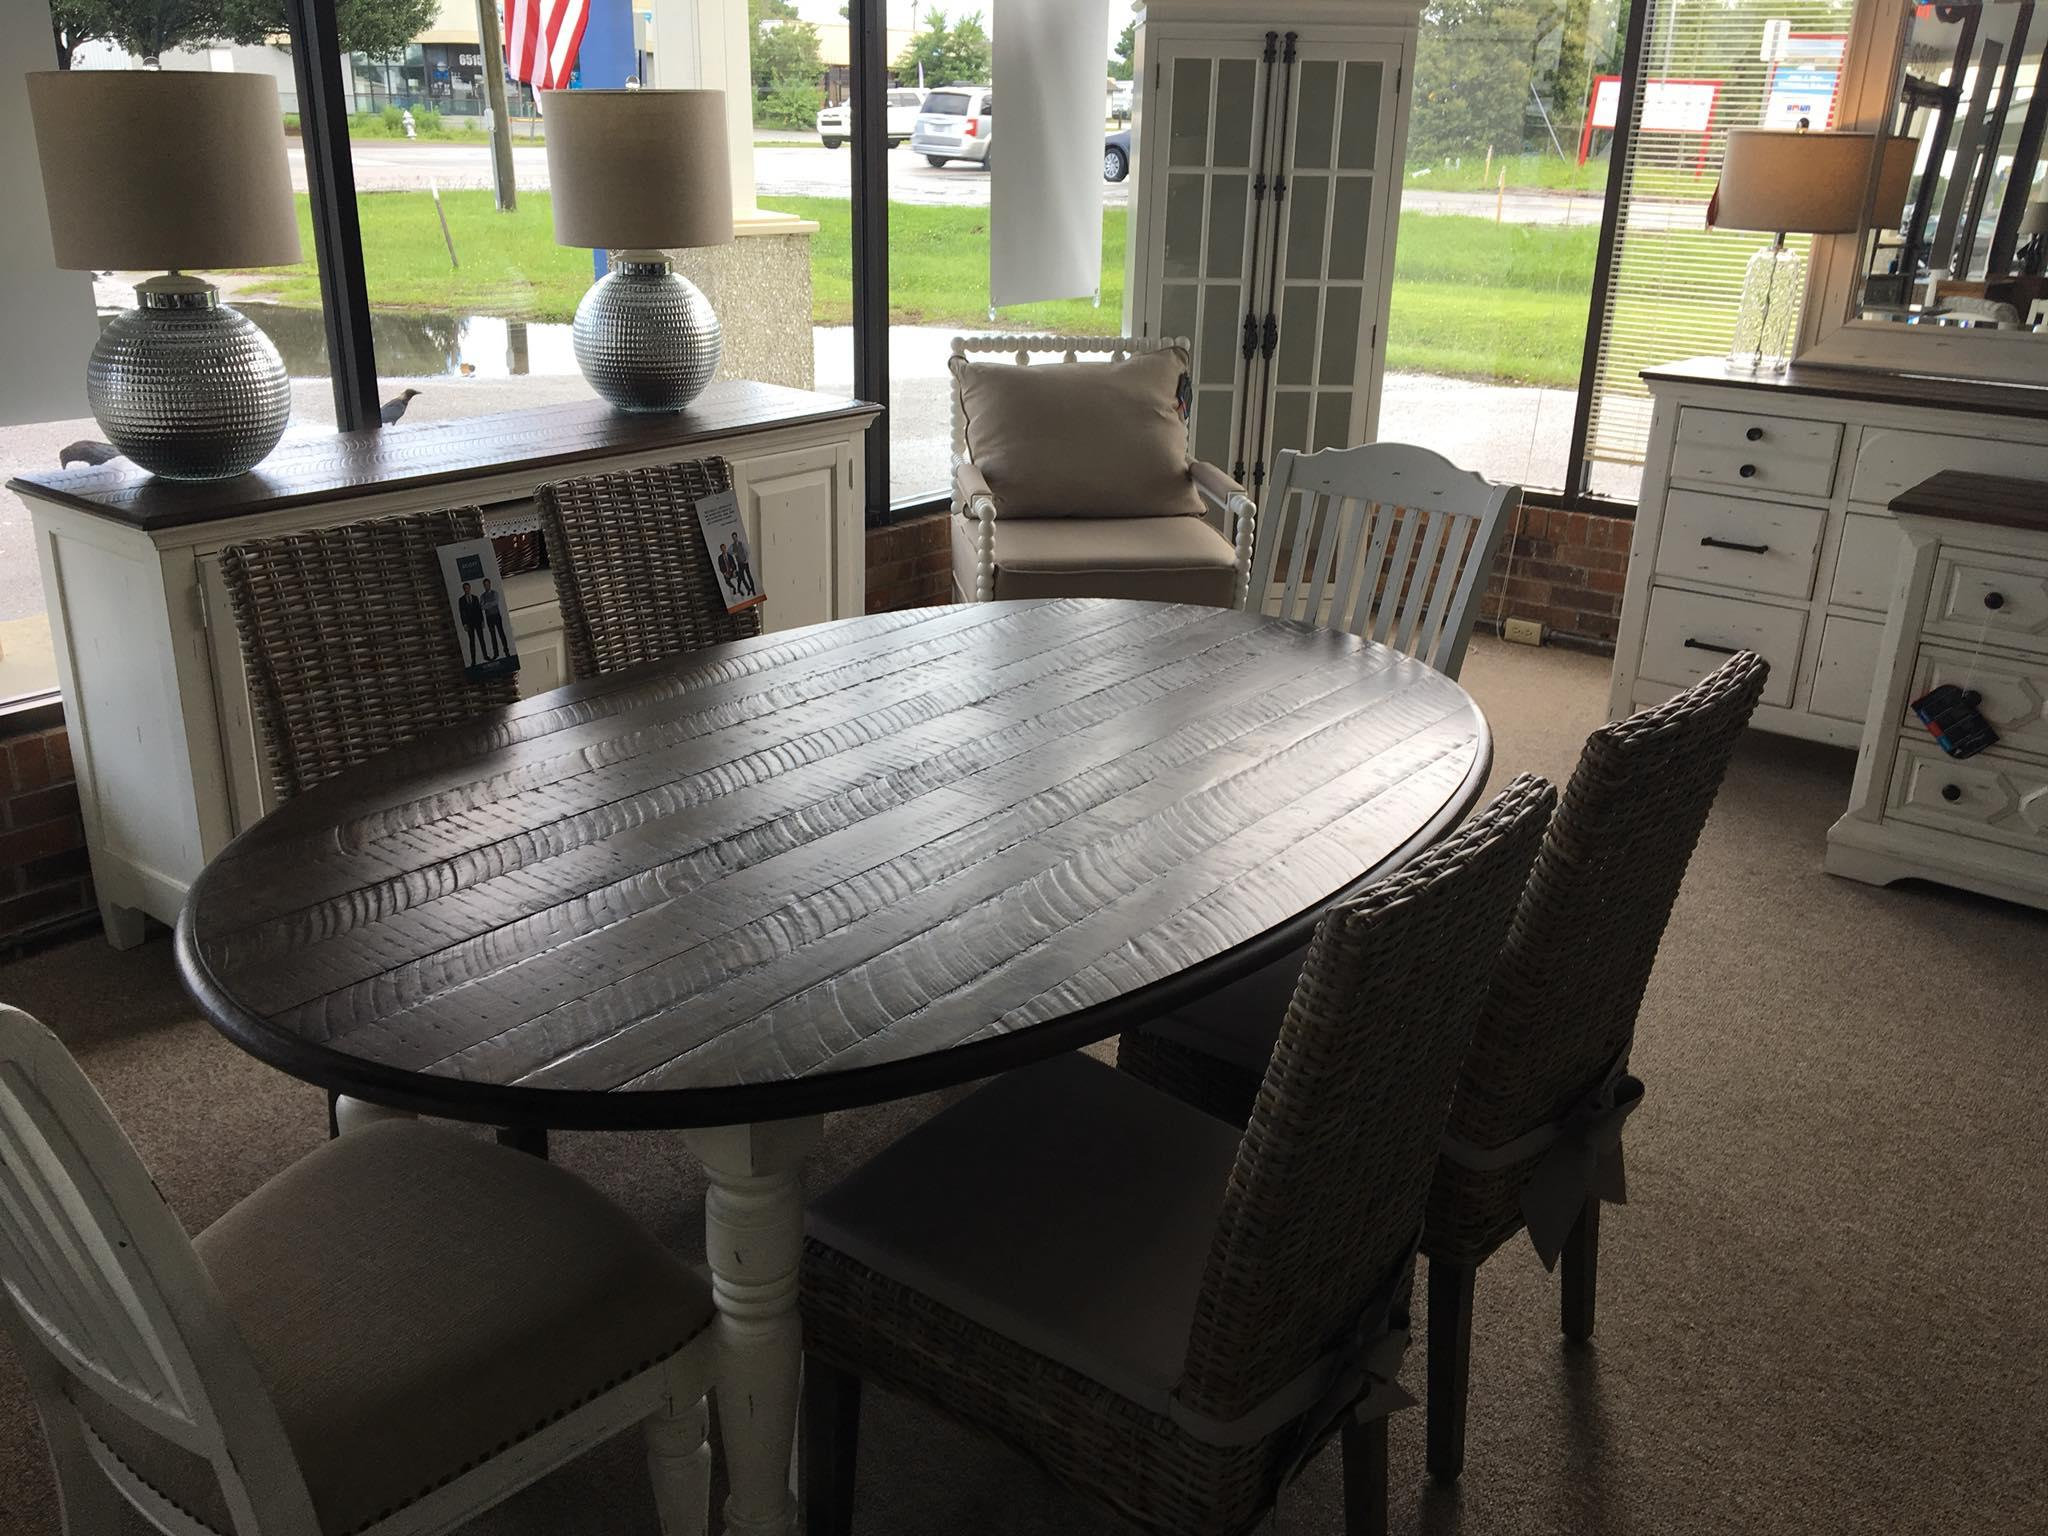 Local Living Furniture image 3